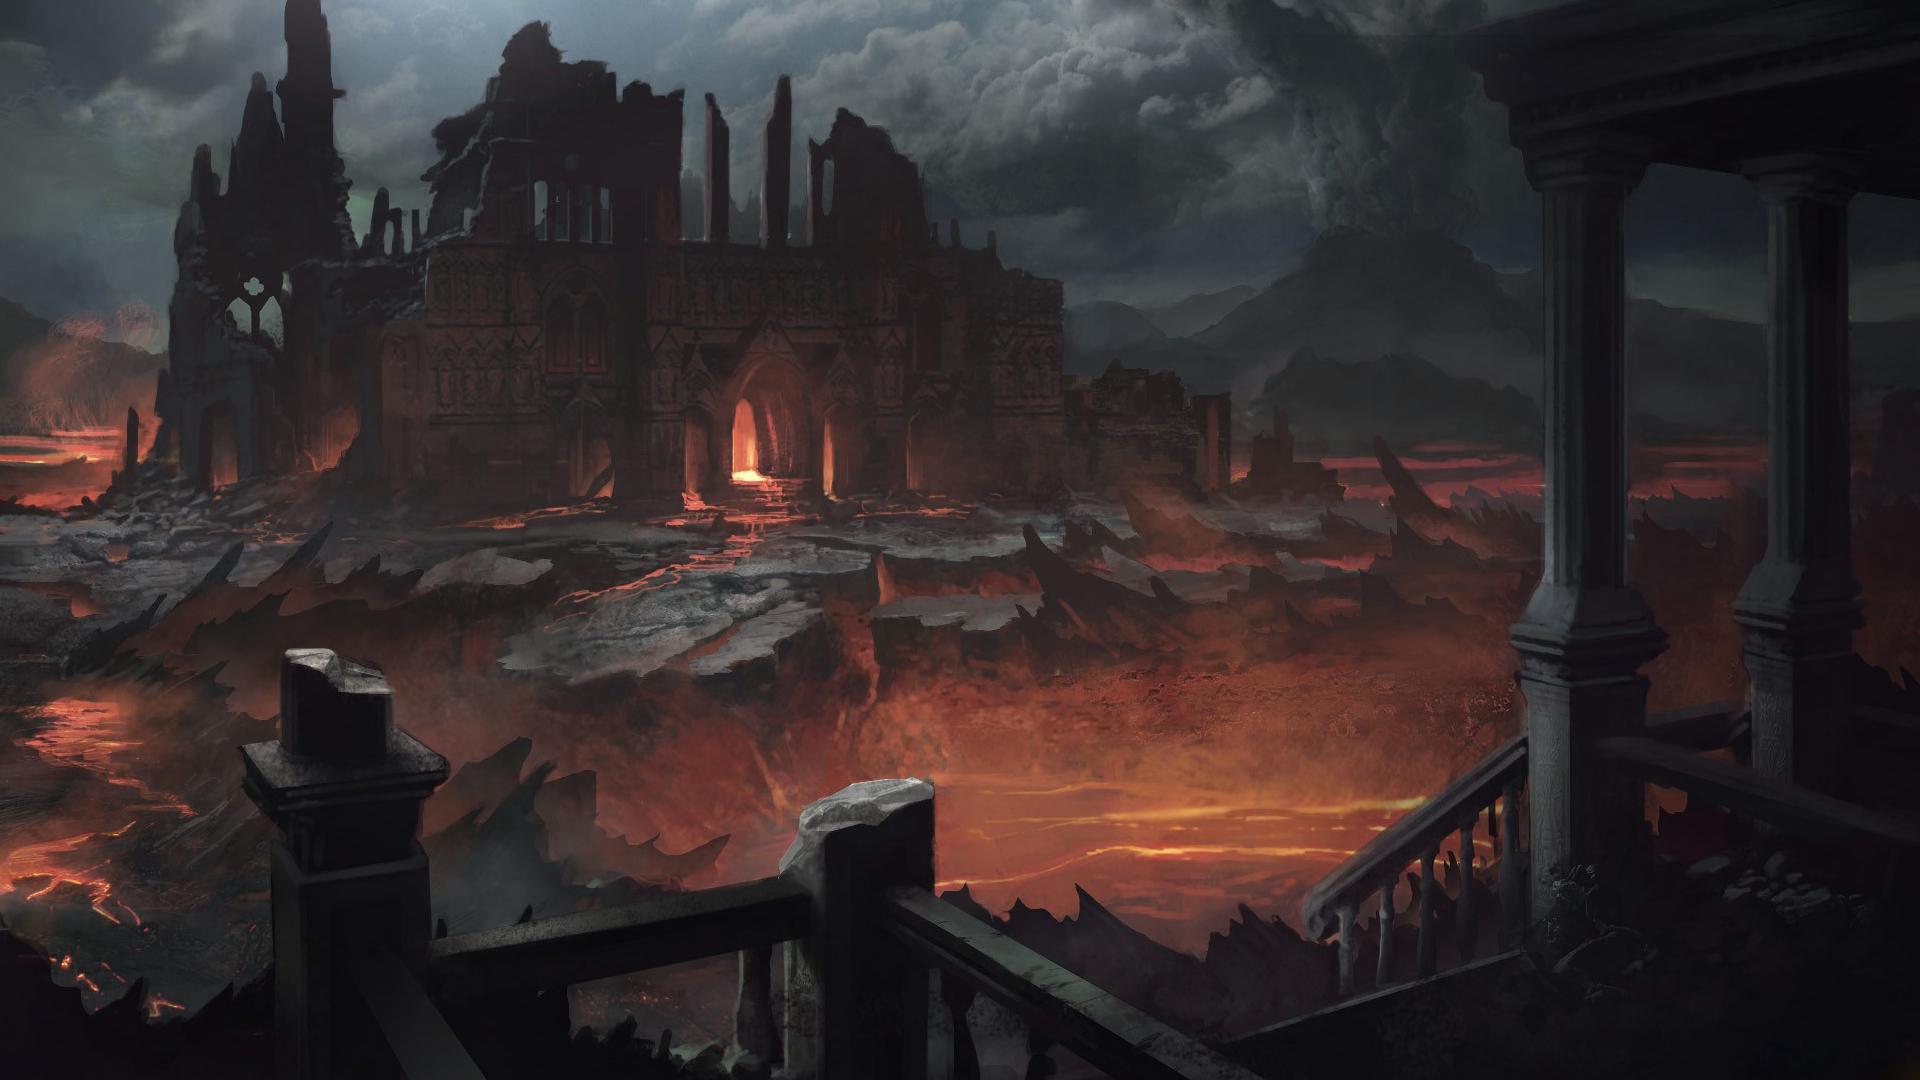 картинки замки из ада ледяного